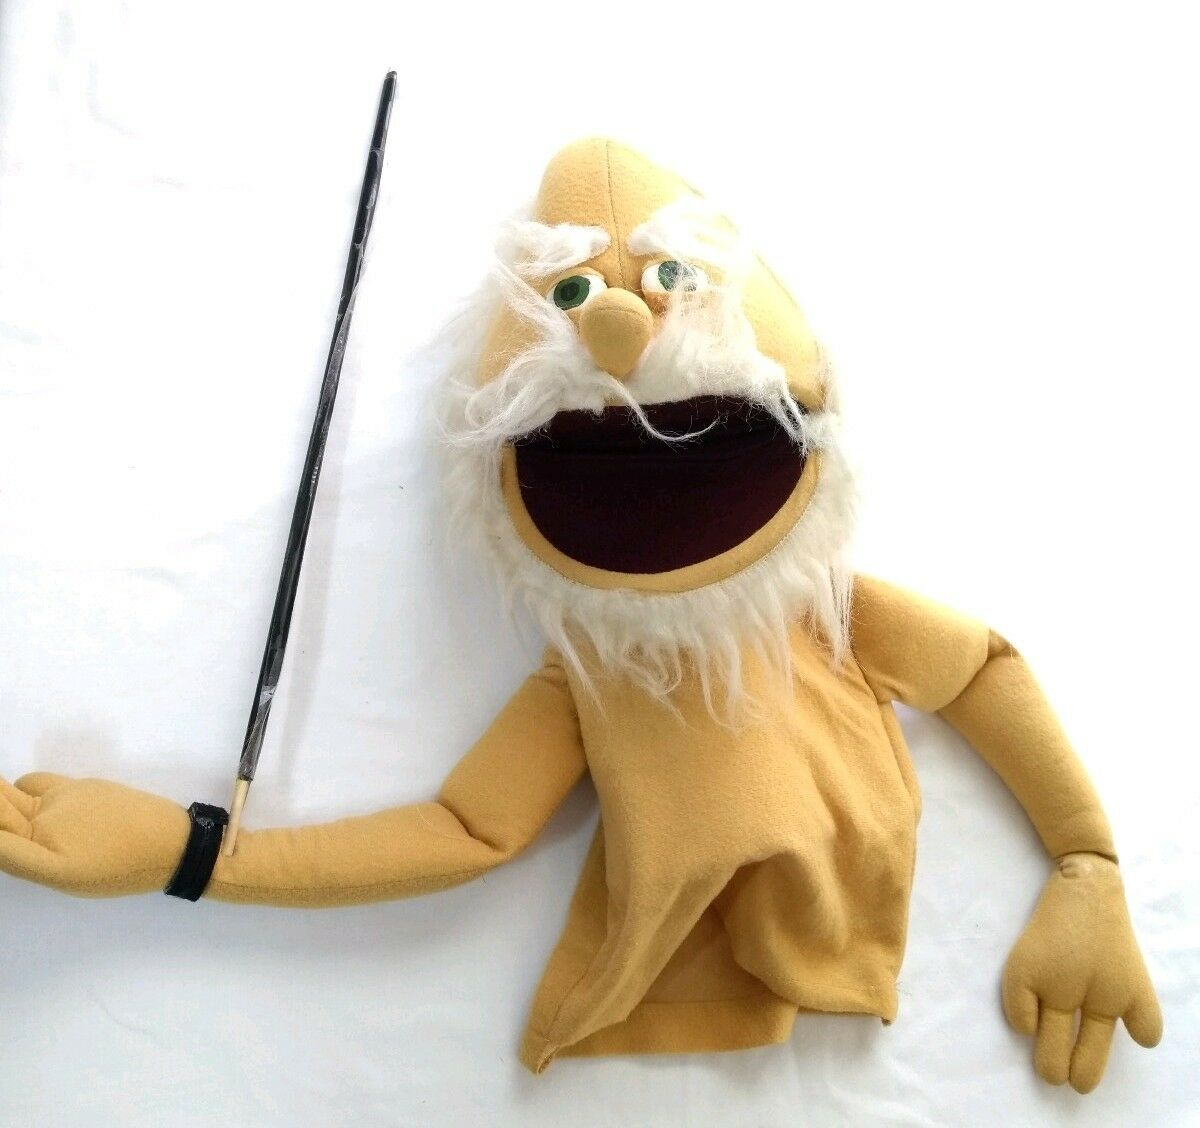 Vintage Hand Puppet Muppets Old Man 1977